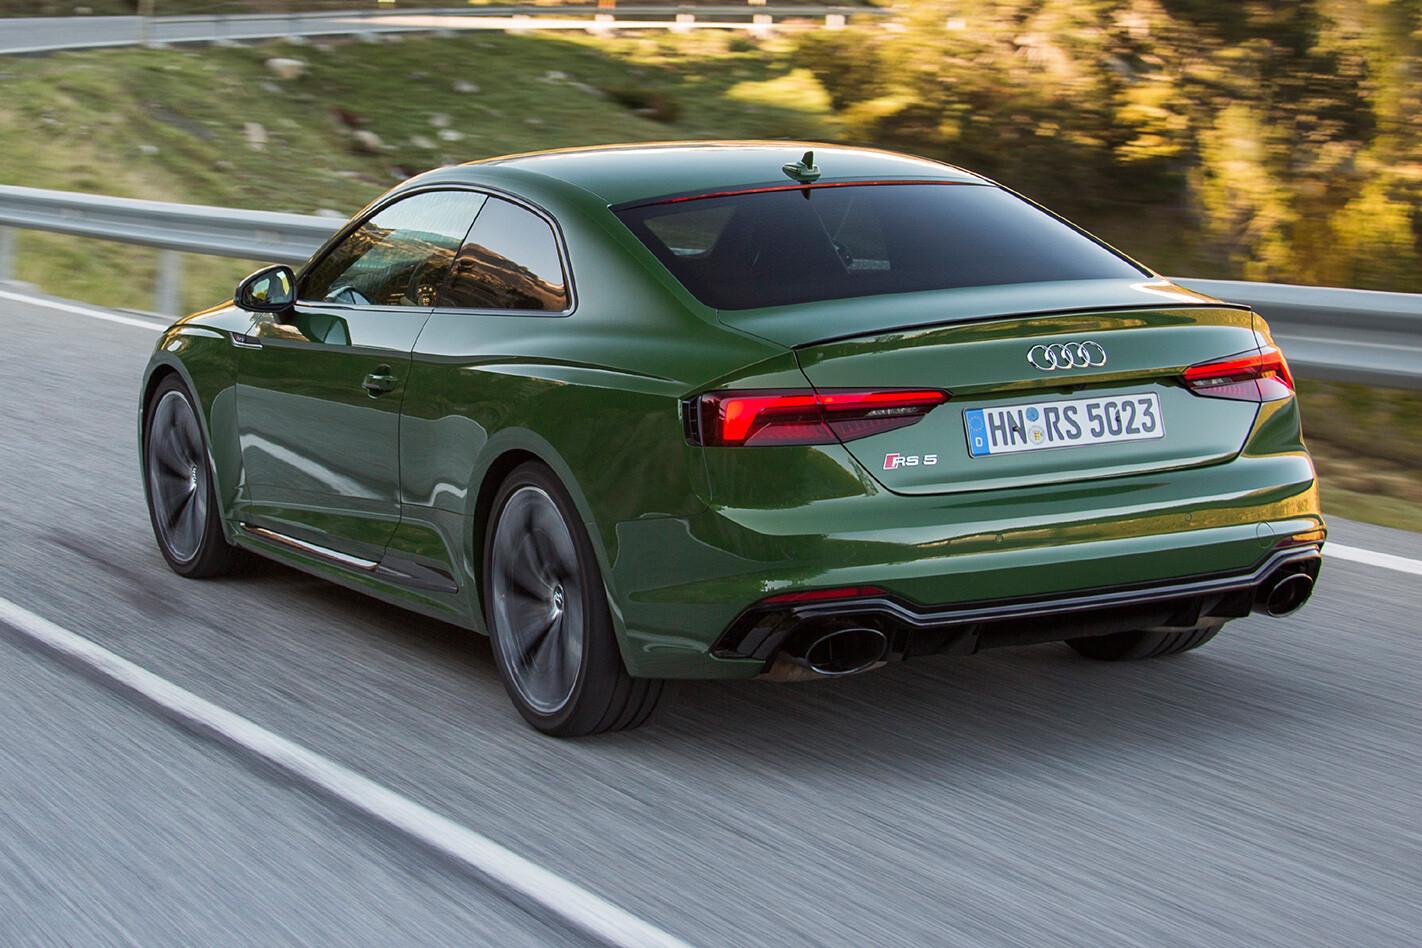 2017 Audi RS5 rear